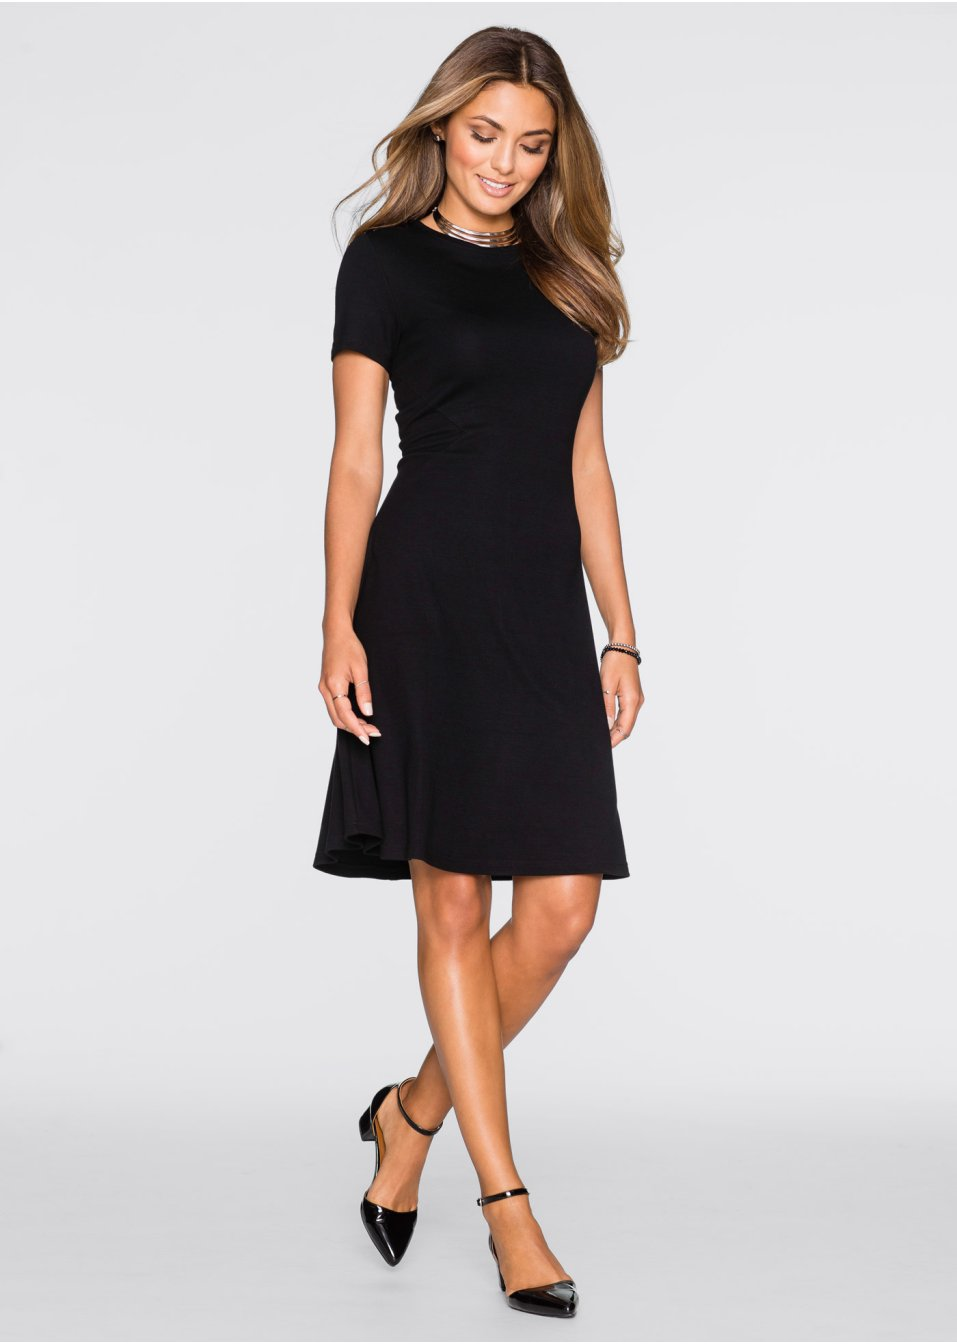 Kleid schwarz - Damen - bonprix.at